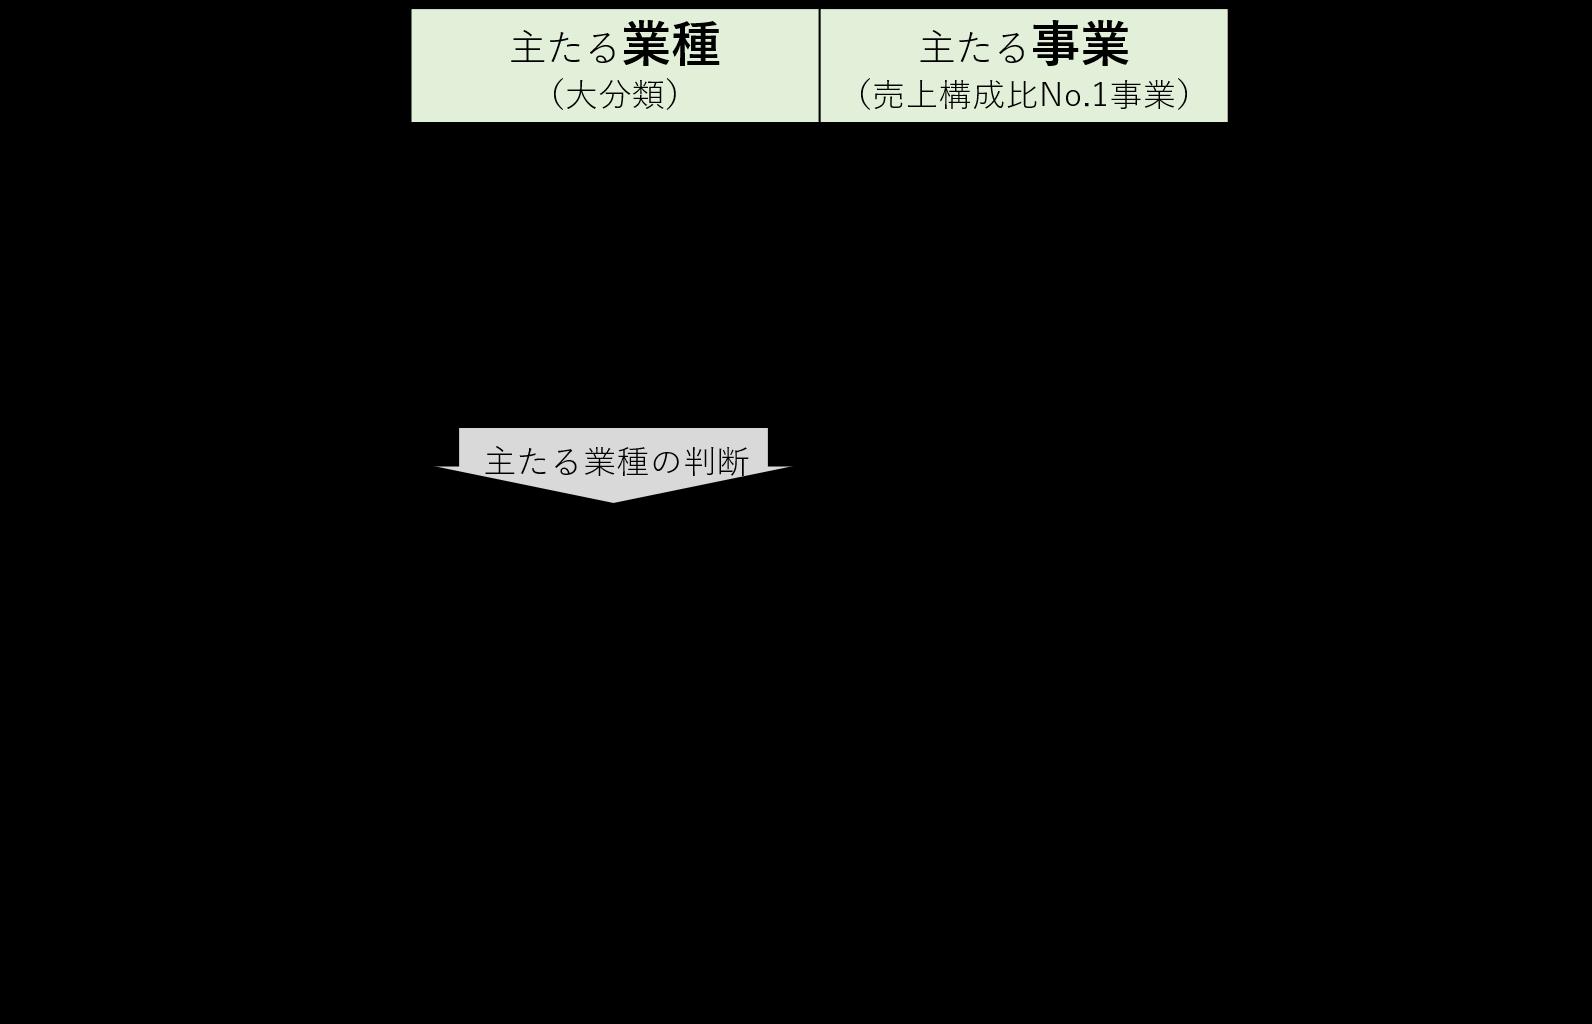 事業再構築の類型